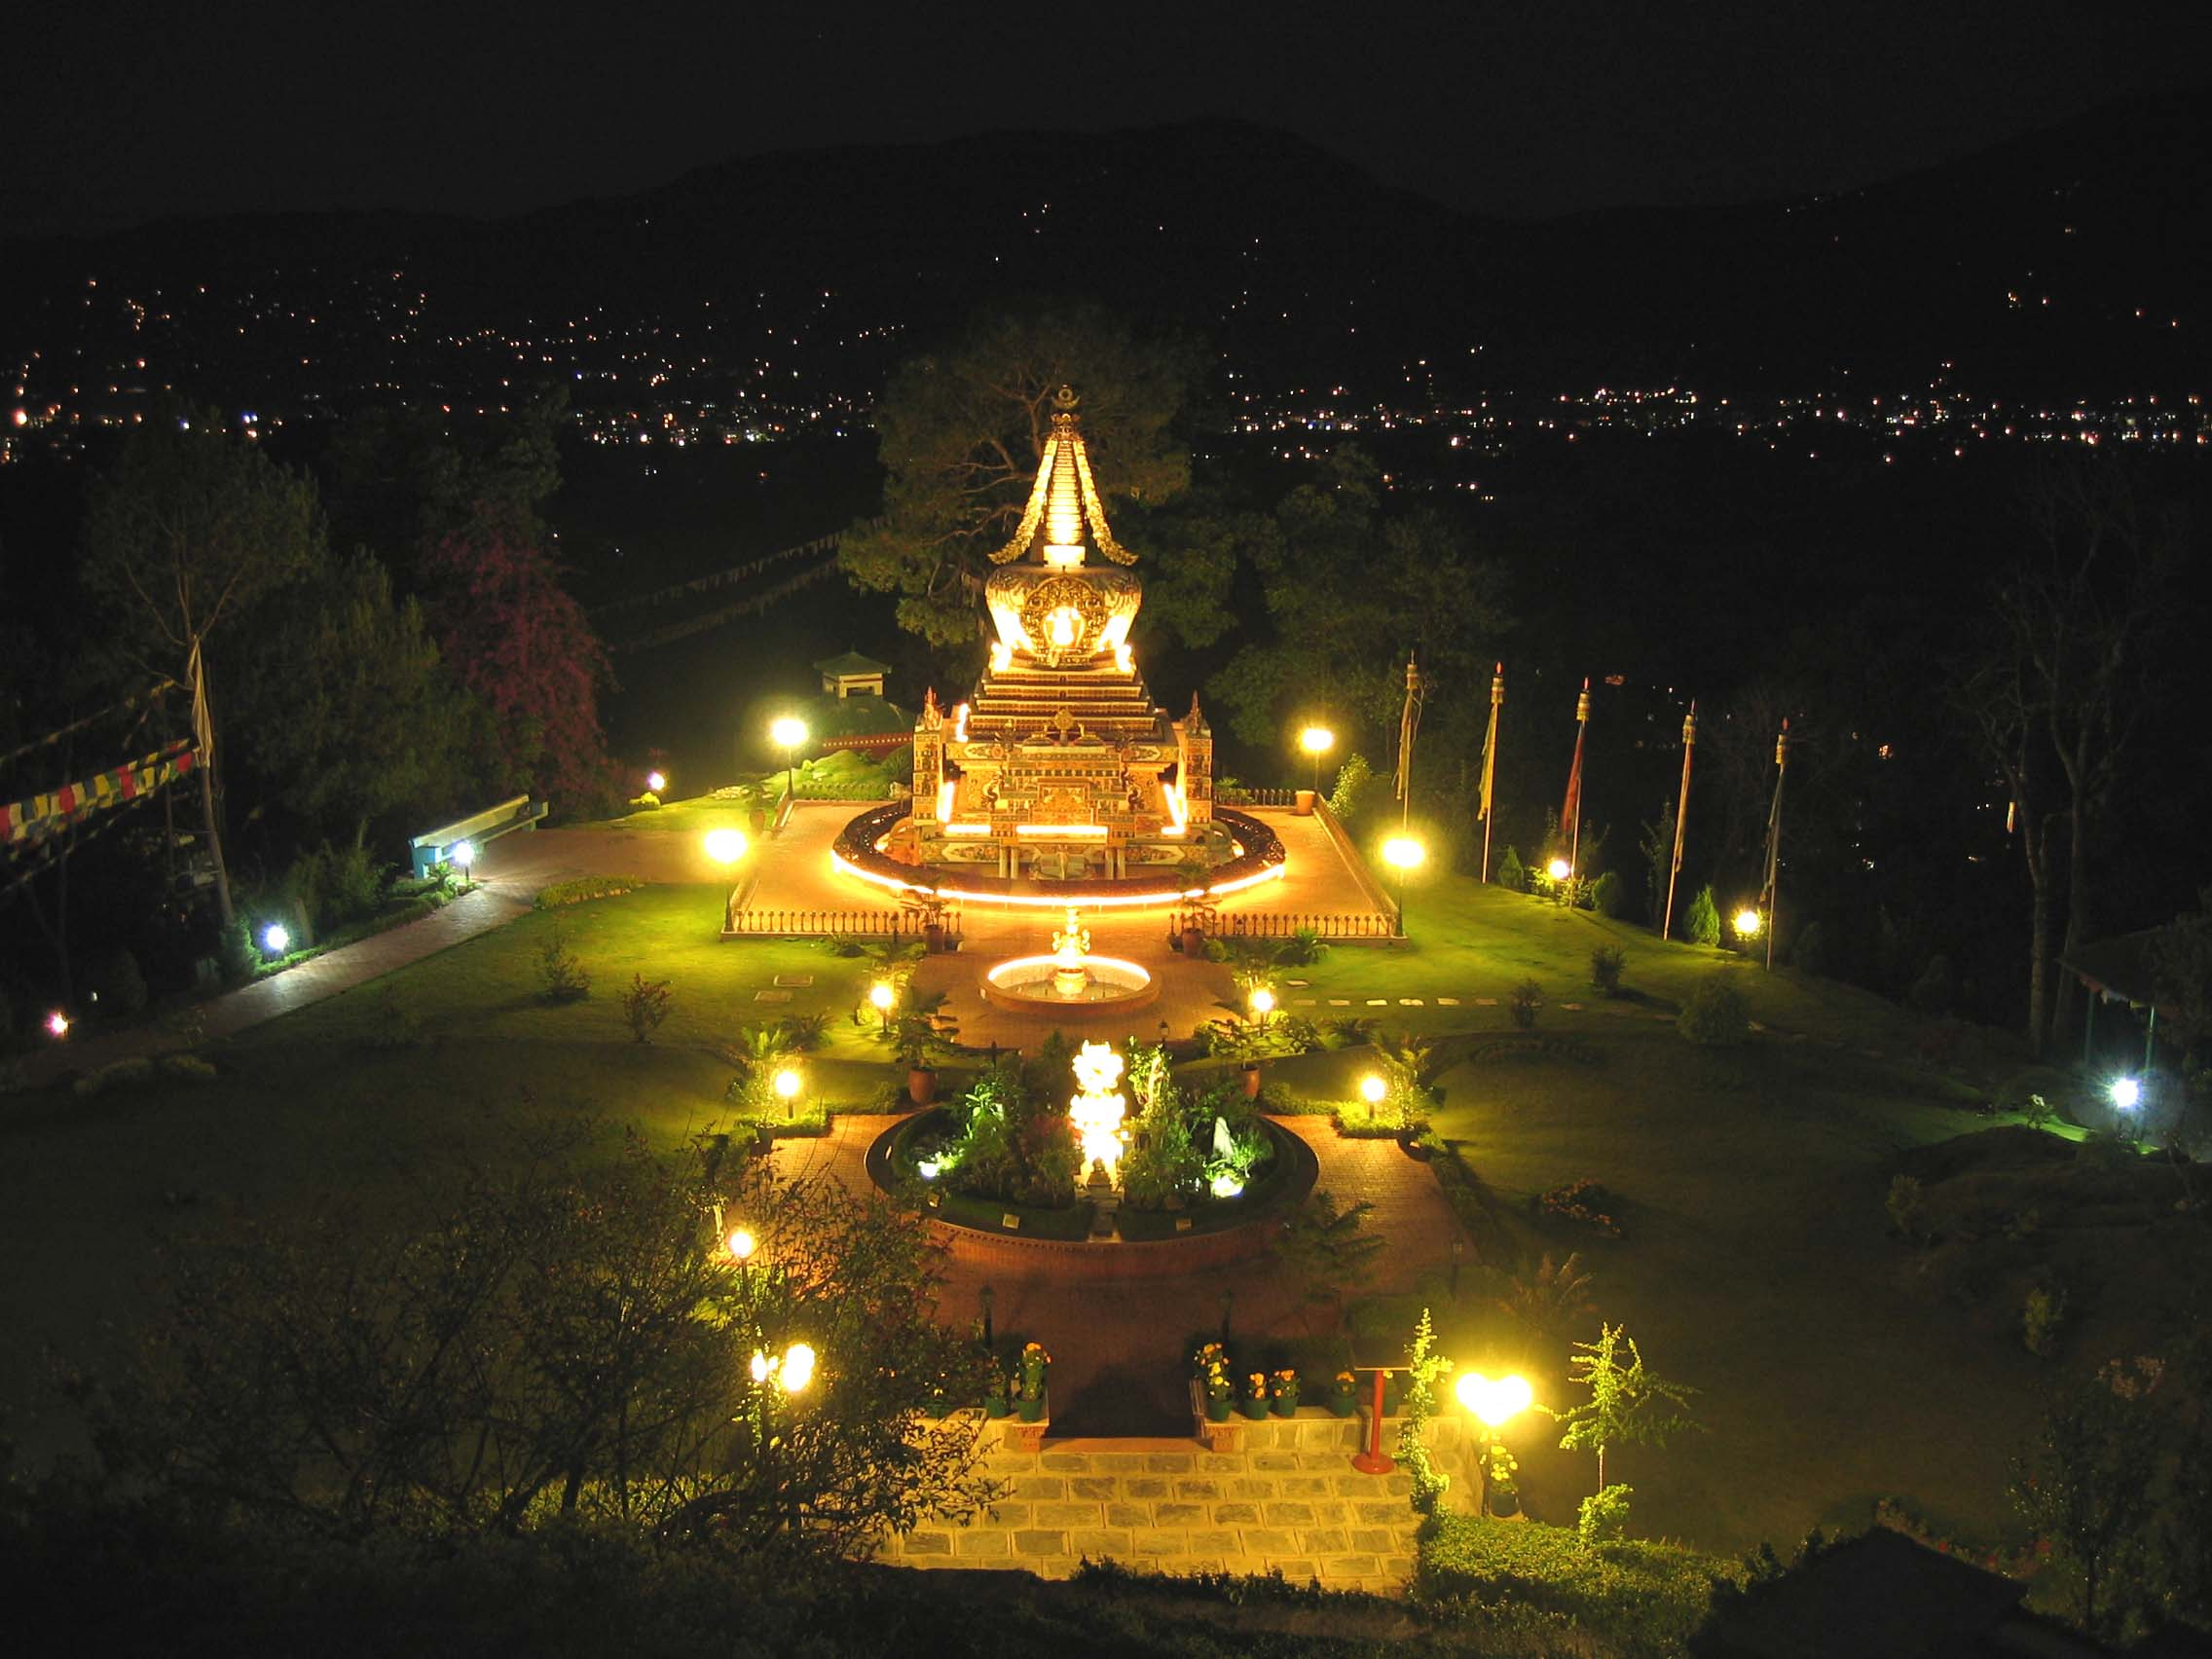 Solar illuminated stupa and gardens at night